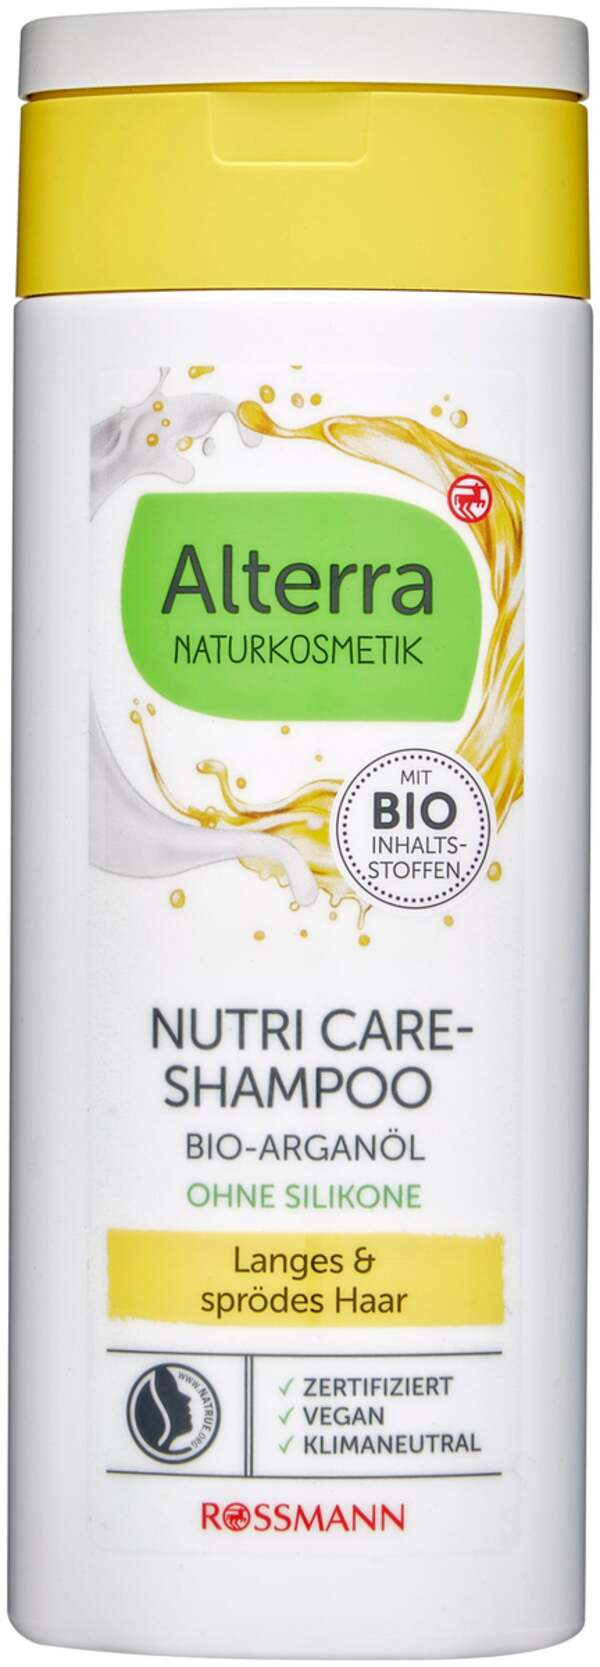 Alterra NATURKOSMETIK Nutri-Care-Shampoo